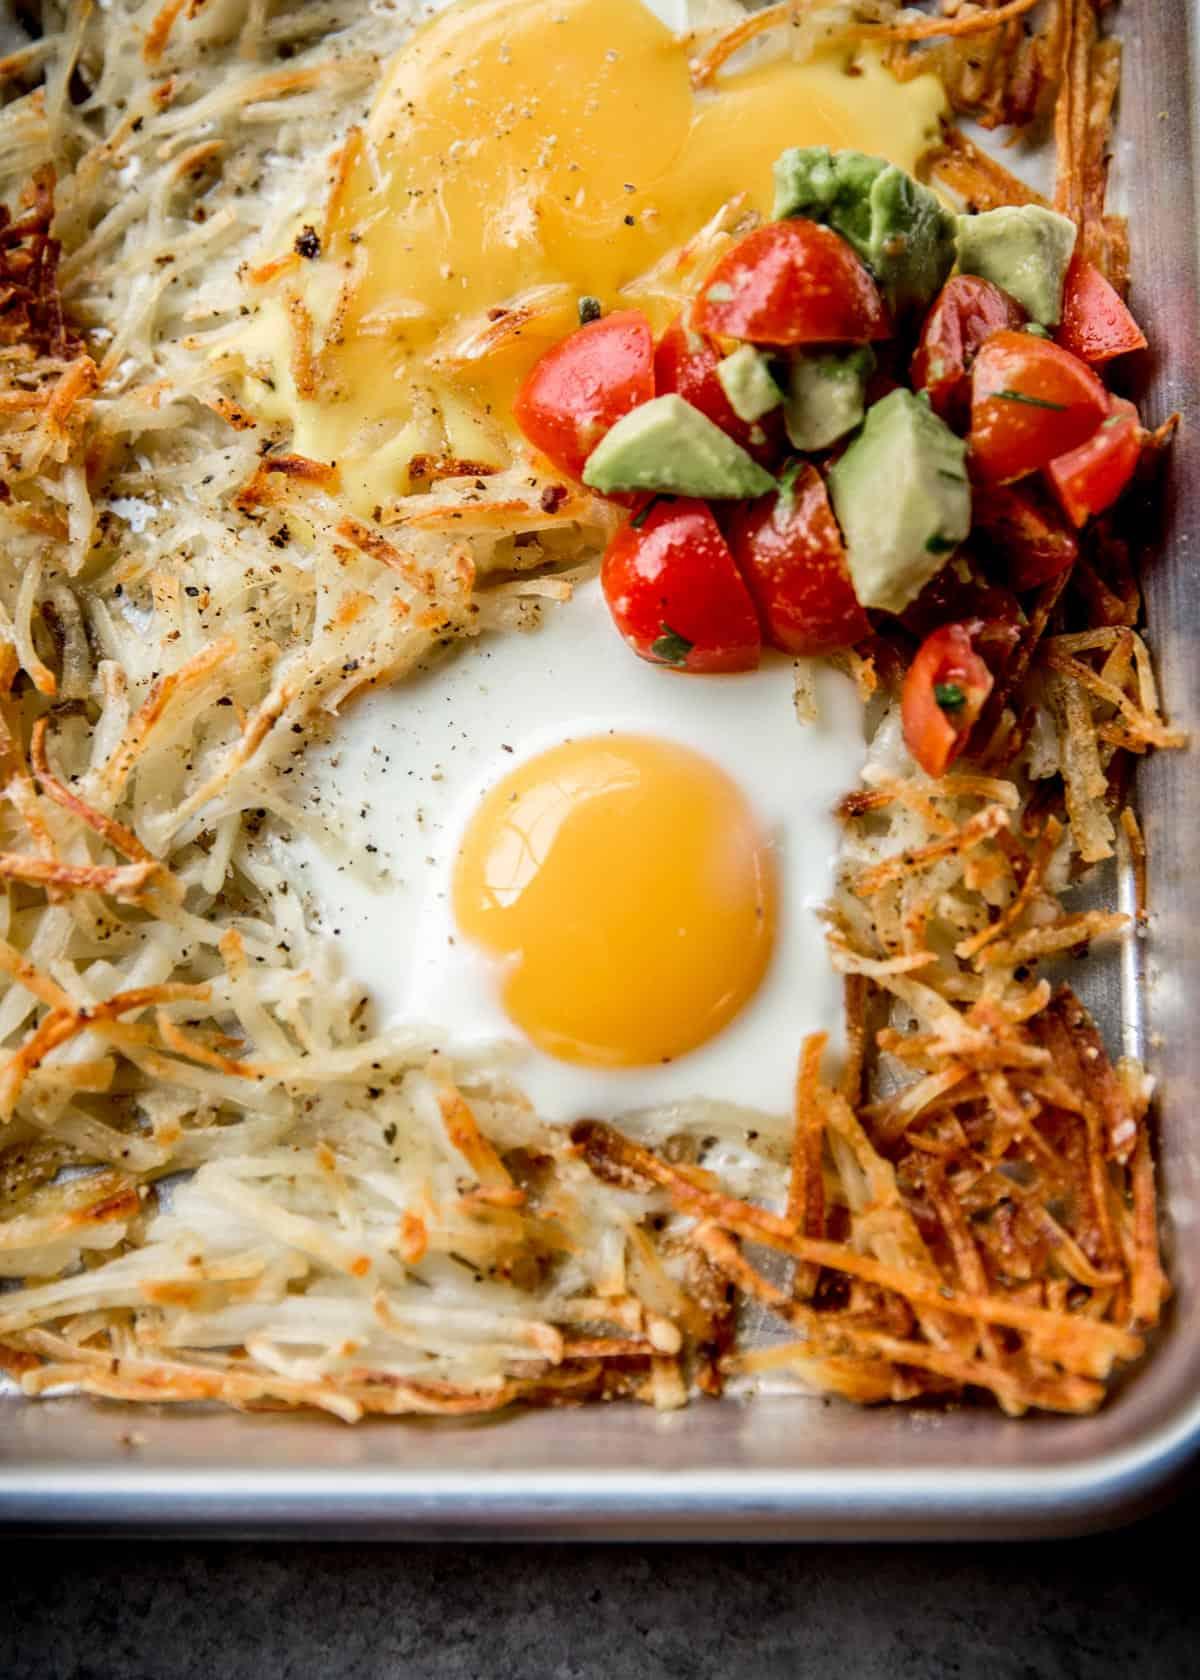 potatoes, eggs and salsa on a sheet pan